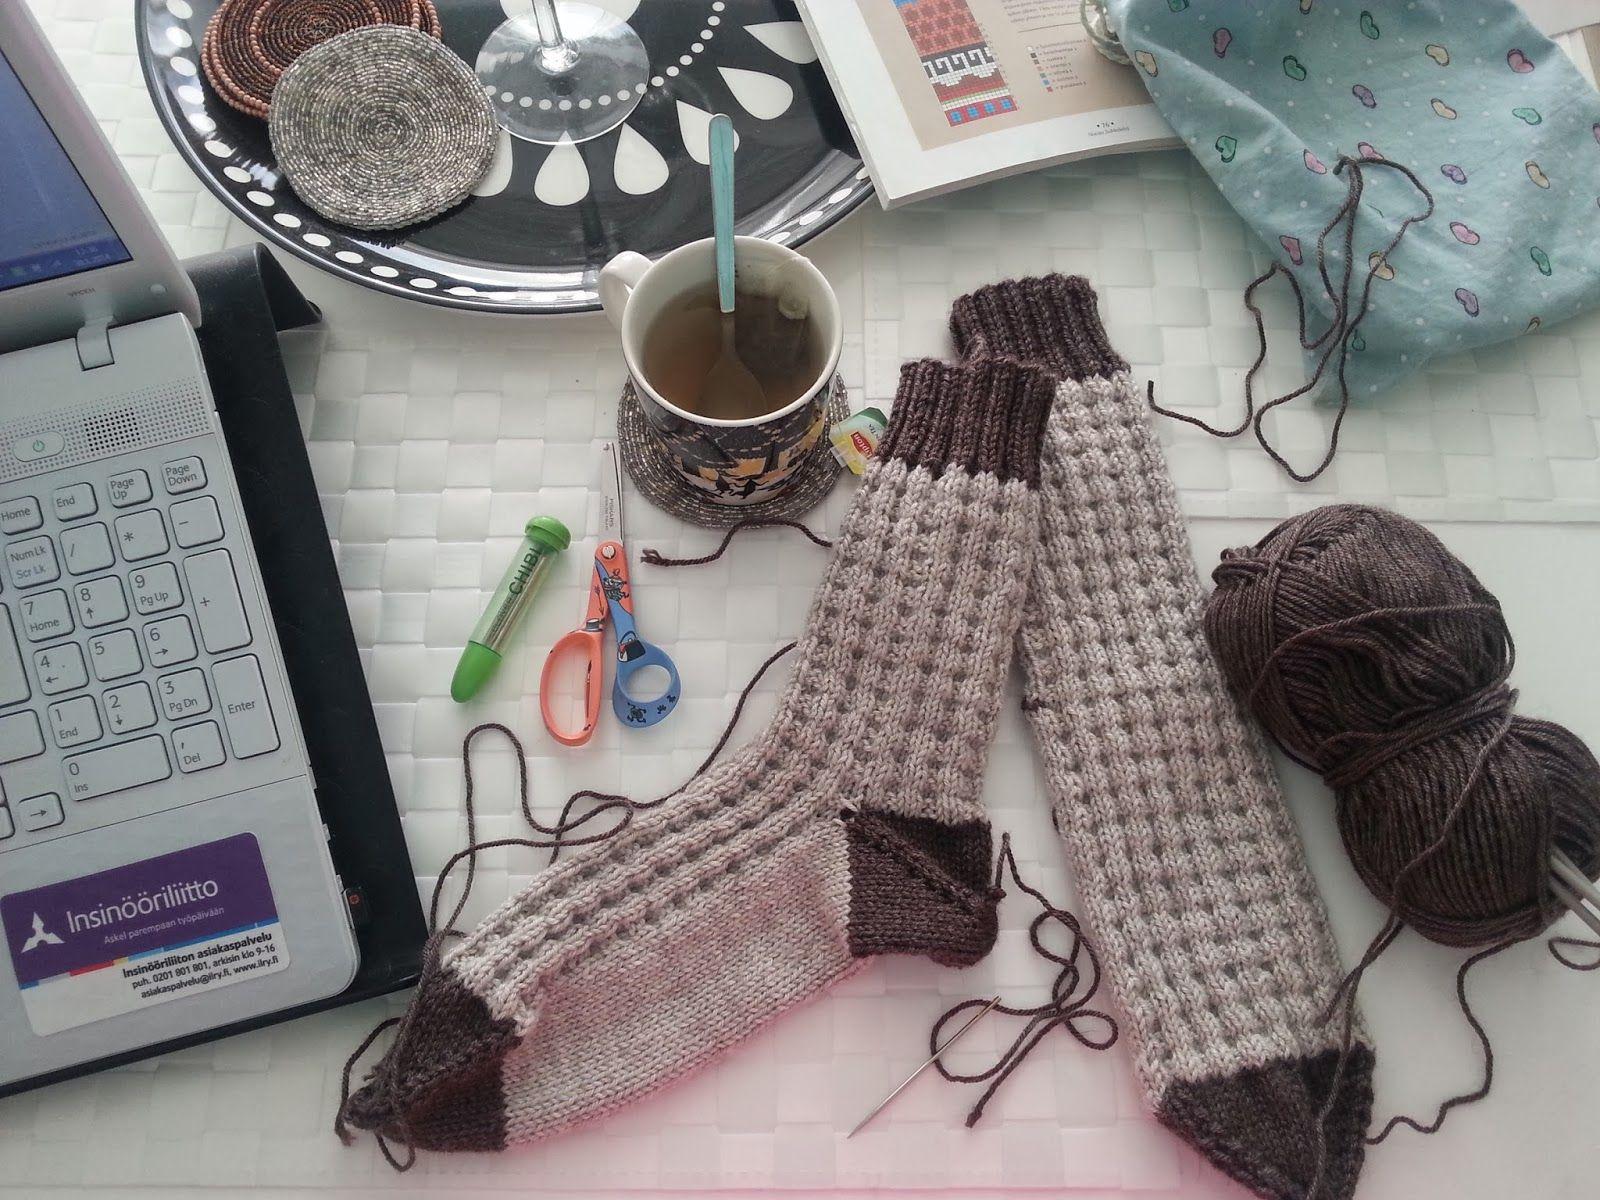 Some knitting this morning.